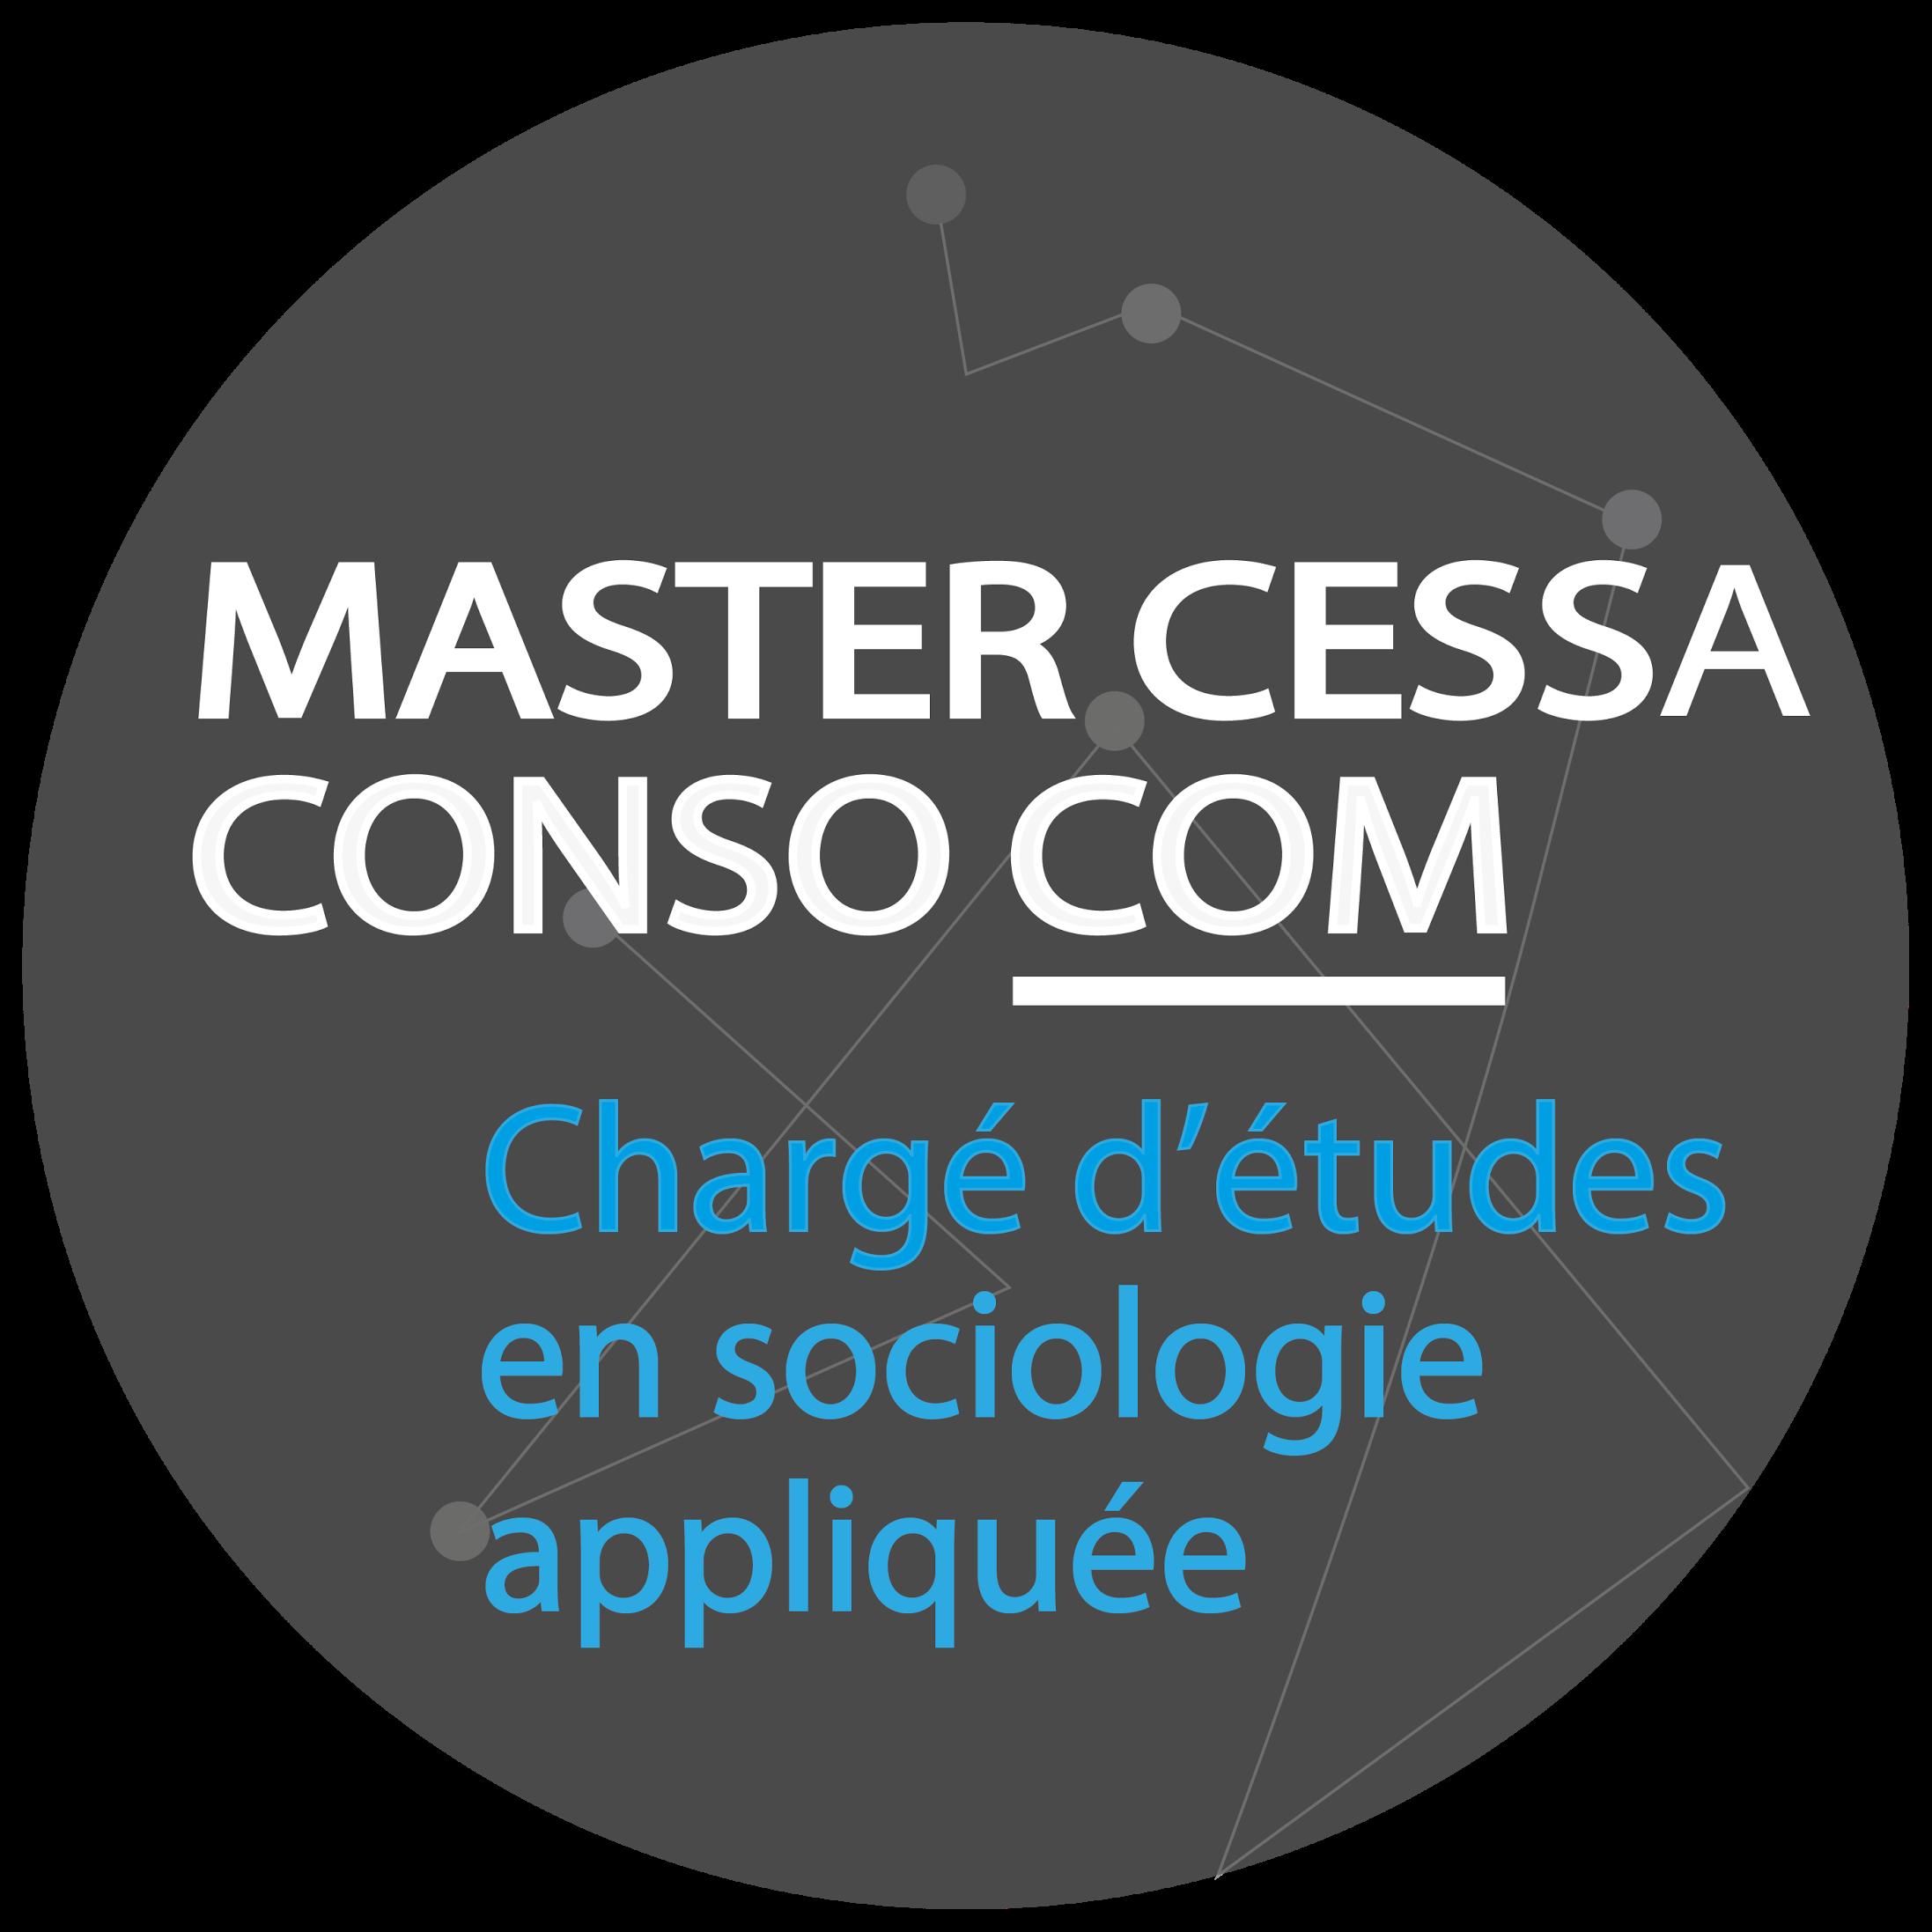 master-cessa